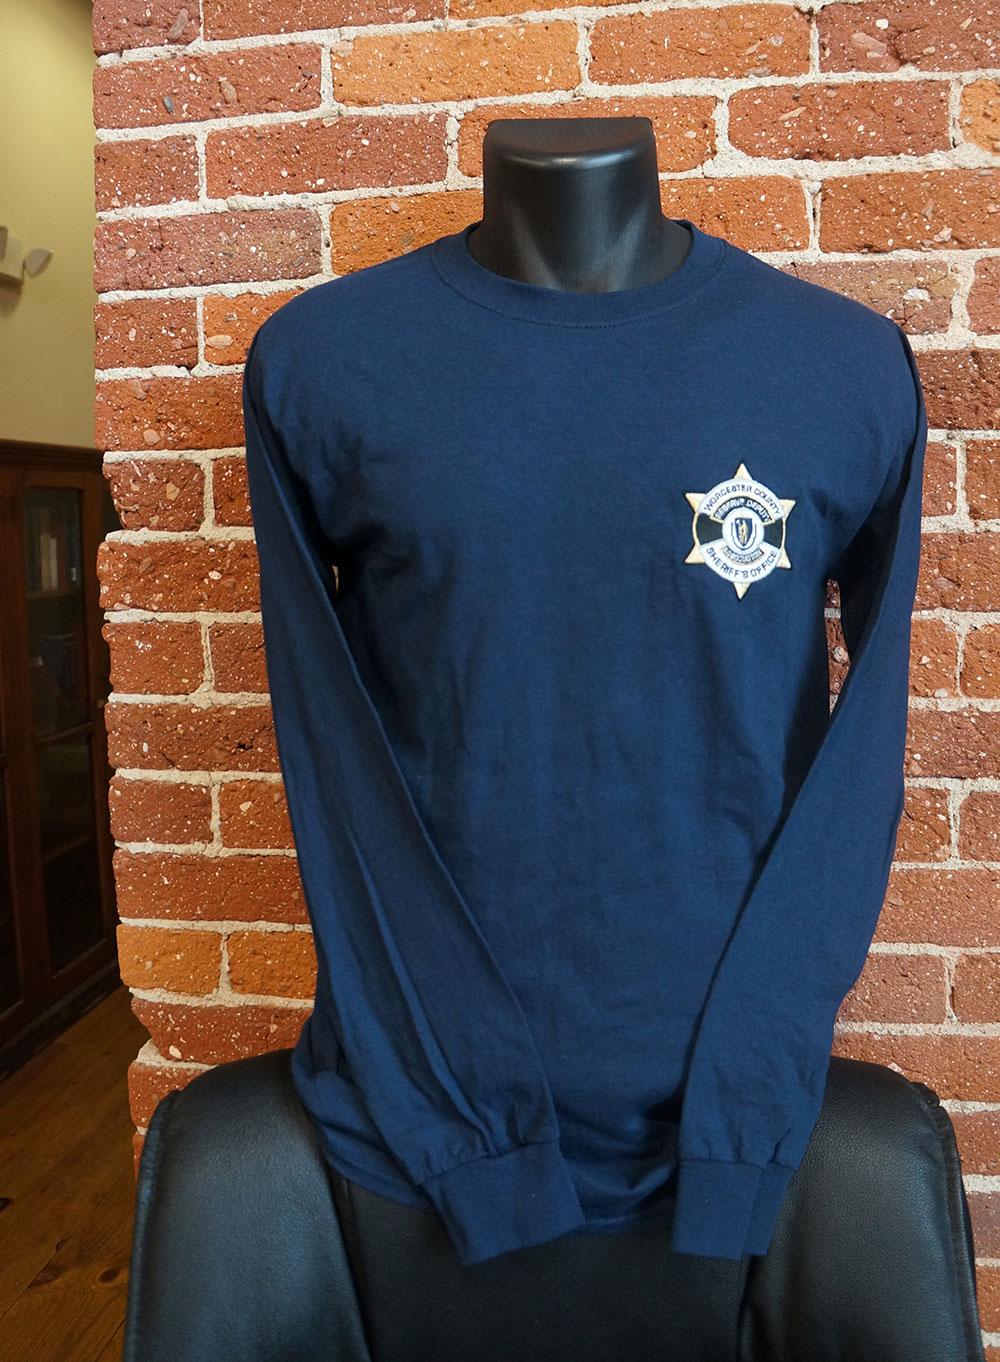 https://0901.nccdn.net/4_2/000/000/07f/249/navy-unisex-athletic-crew-short-sleeve-t-shirts.jpg